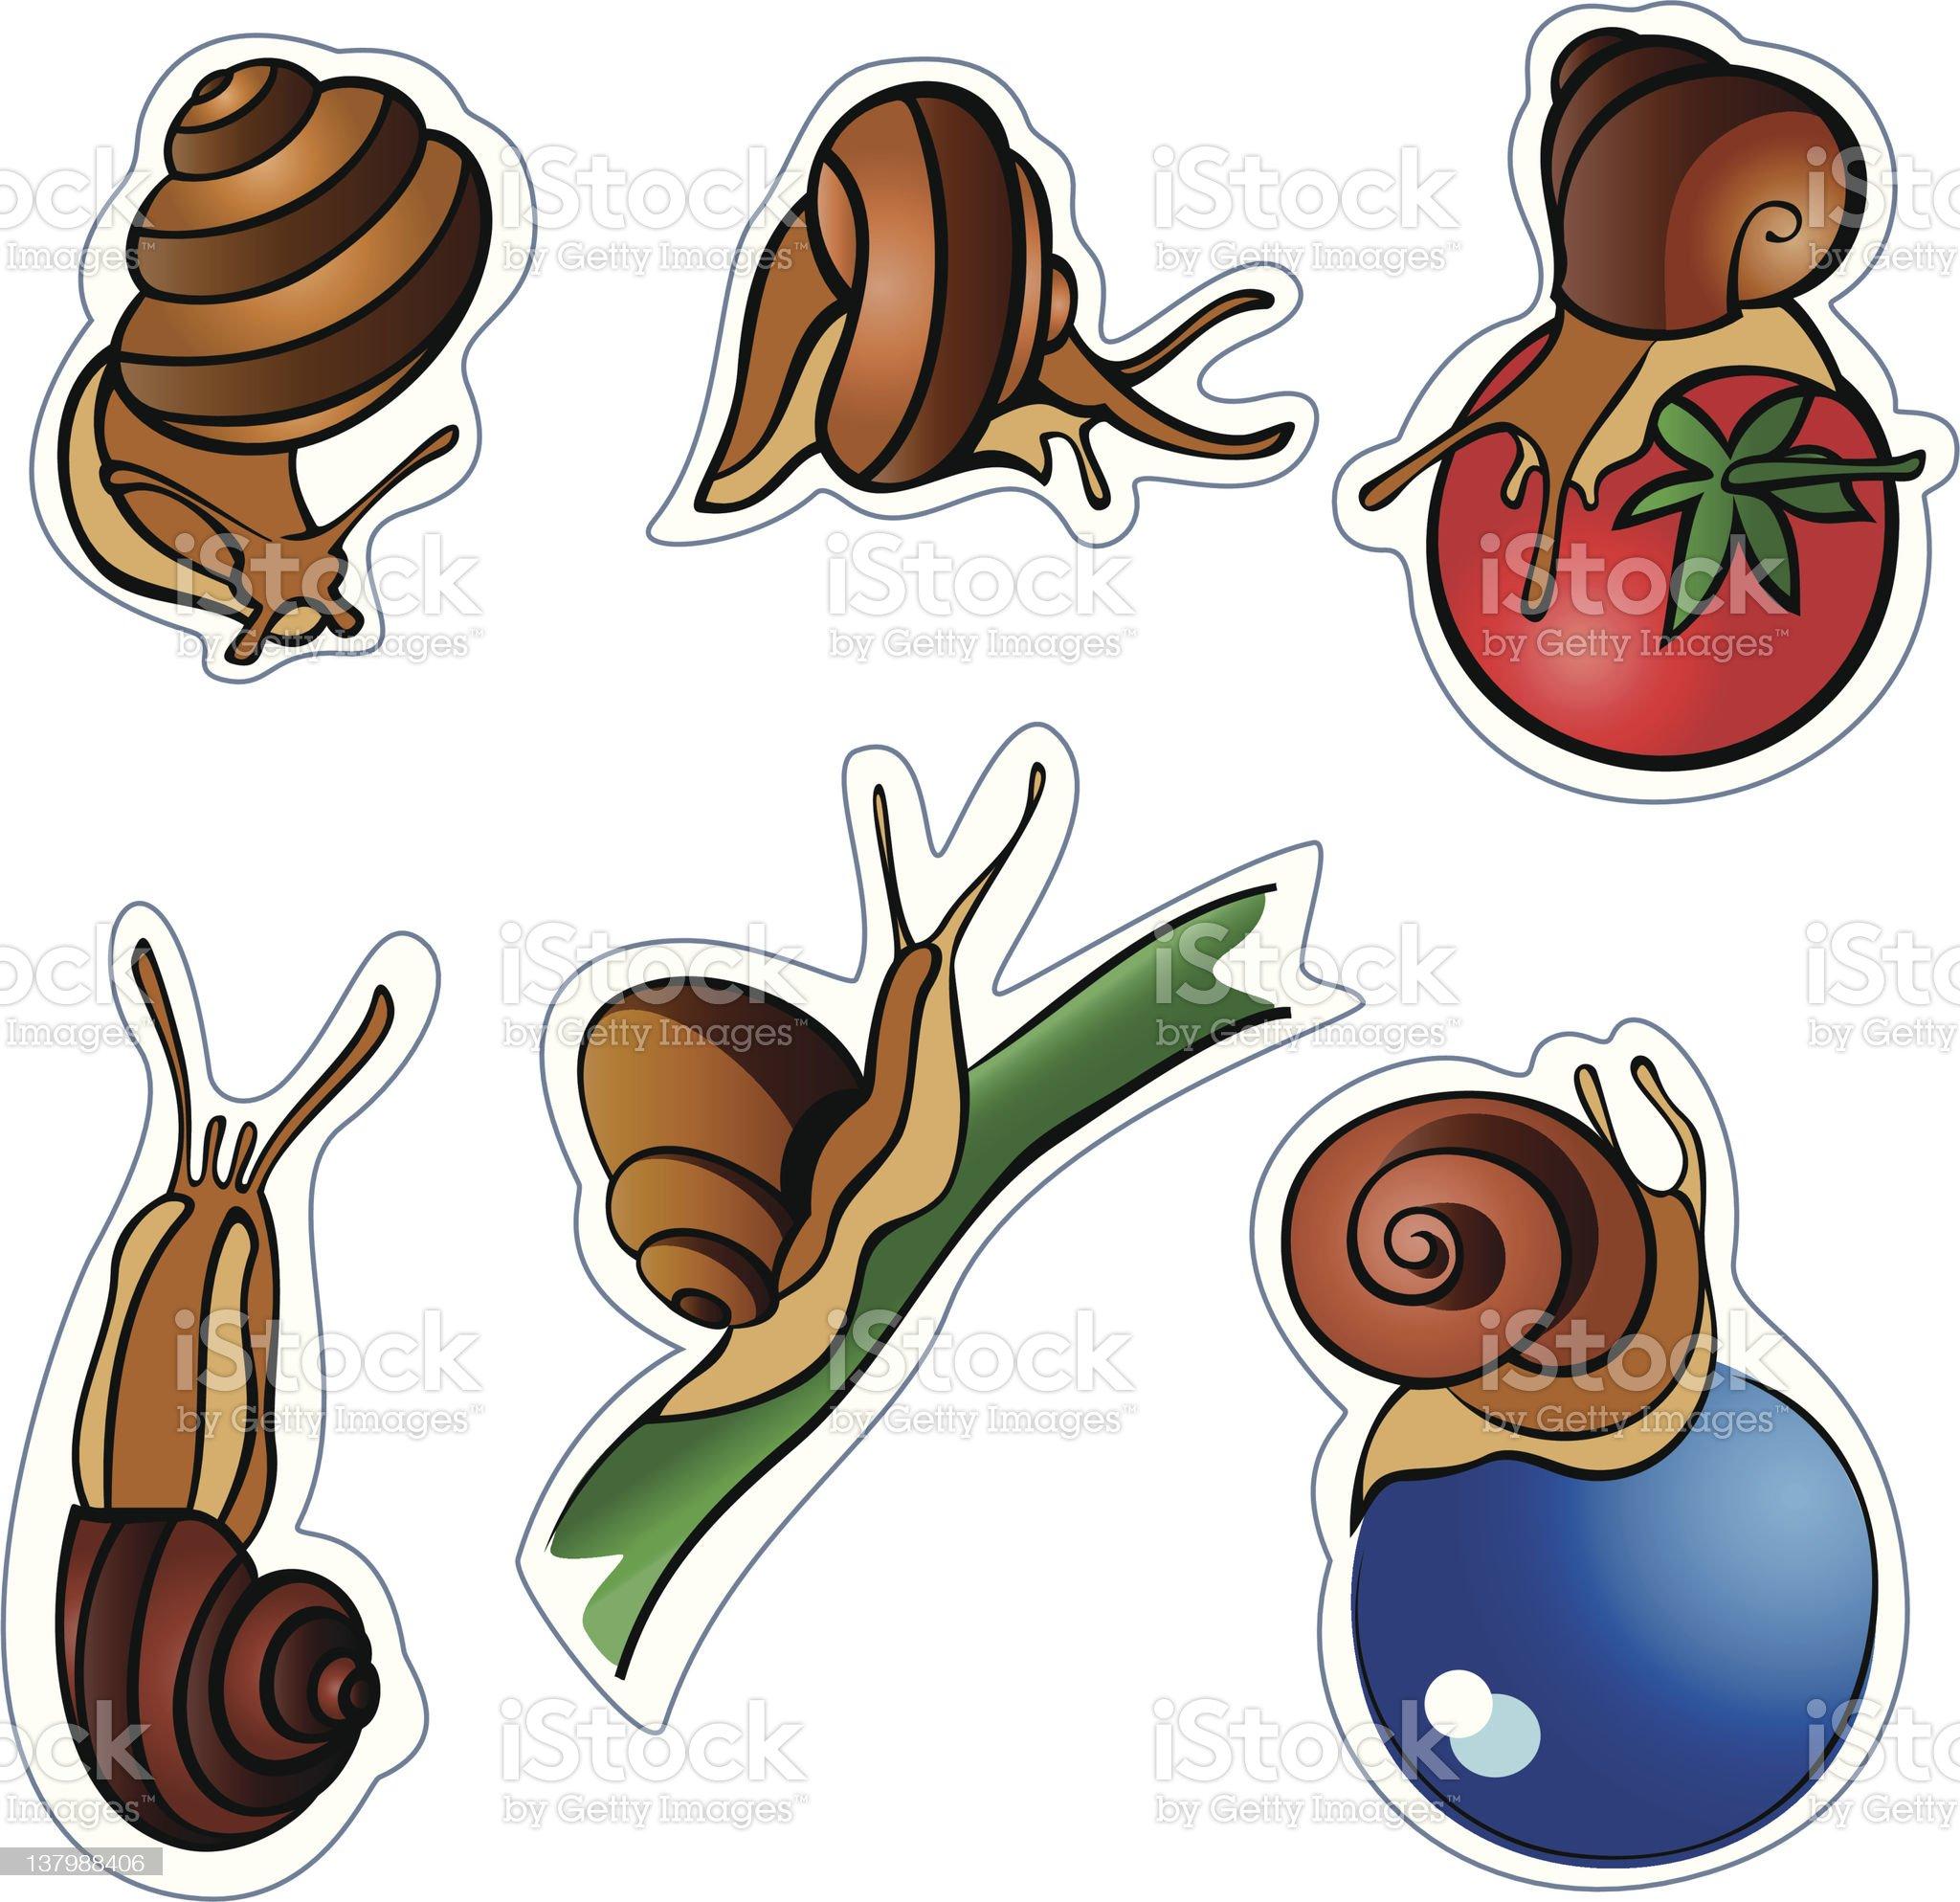 Six slugs royalty-free stock vector art